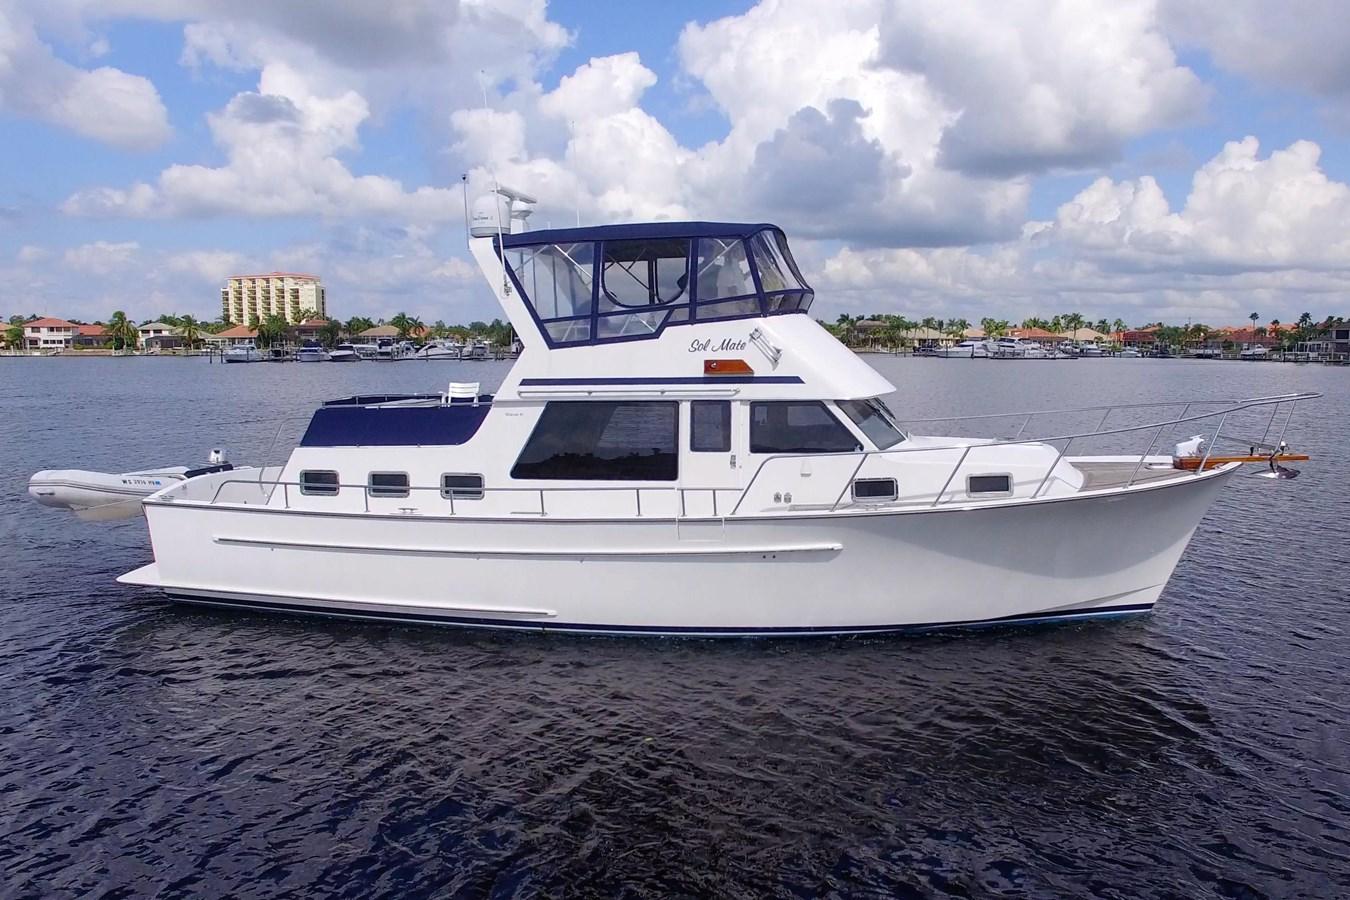 7264623_20191029102303640_1_XLARGE 2004 WESTCOAST 46 Trawler Trawler 2757836